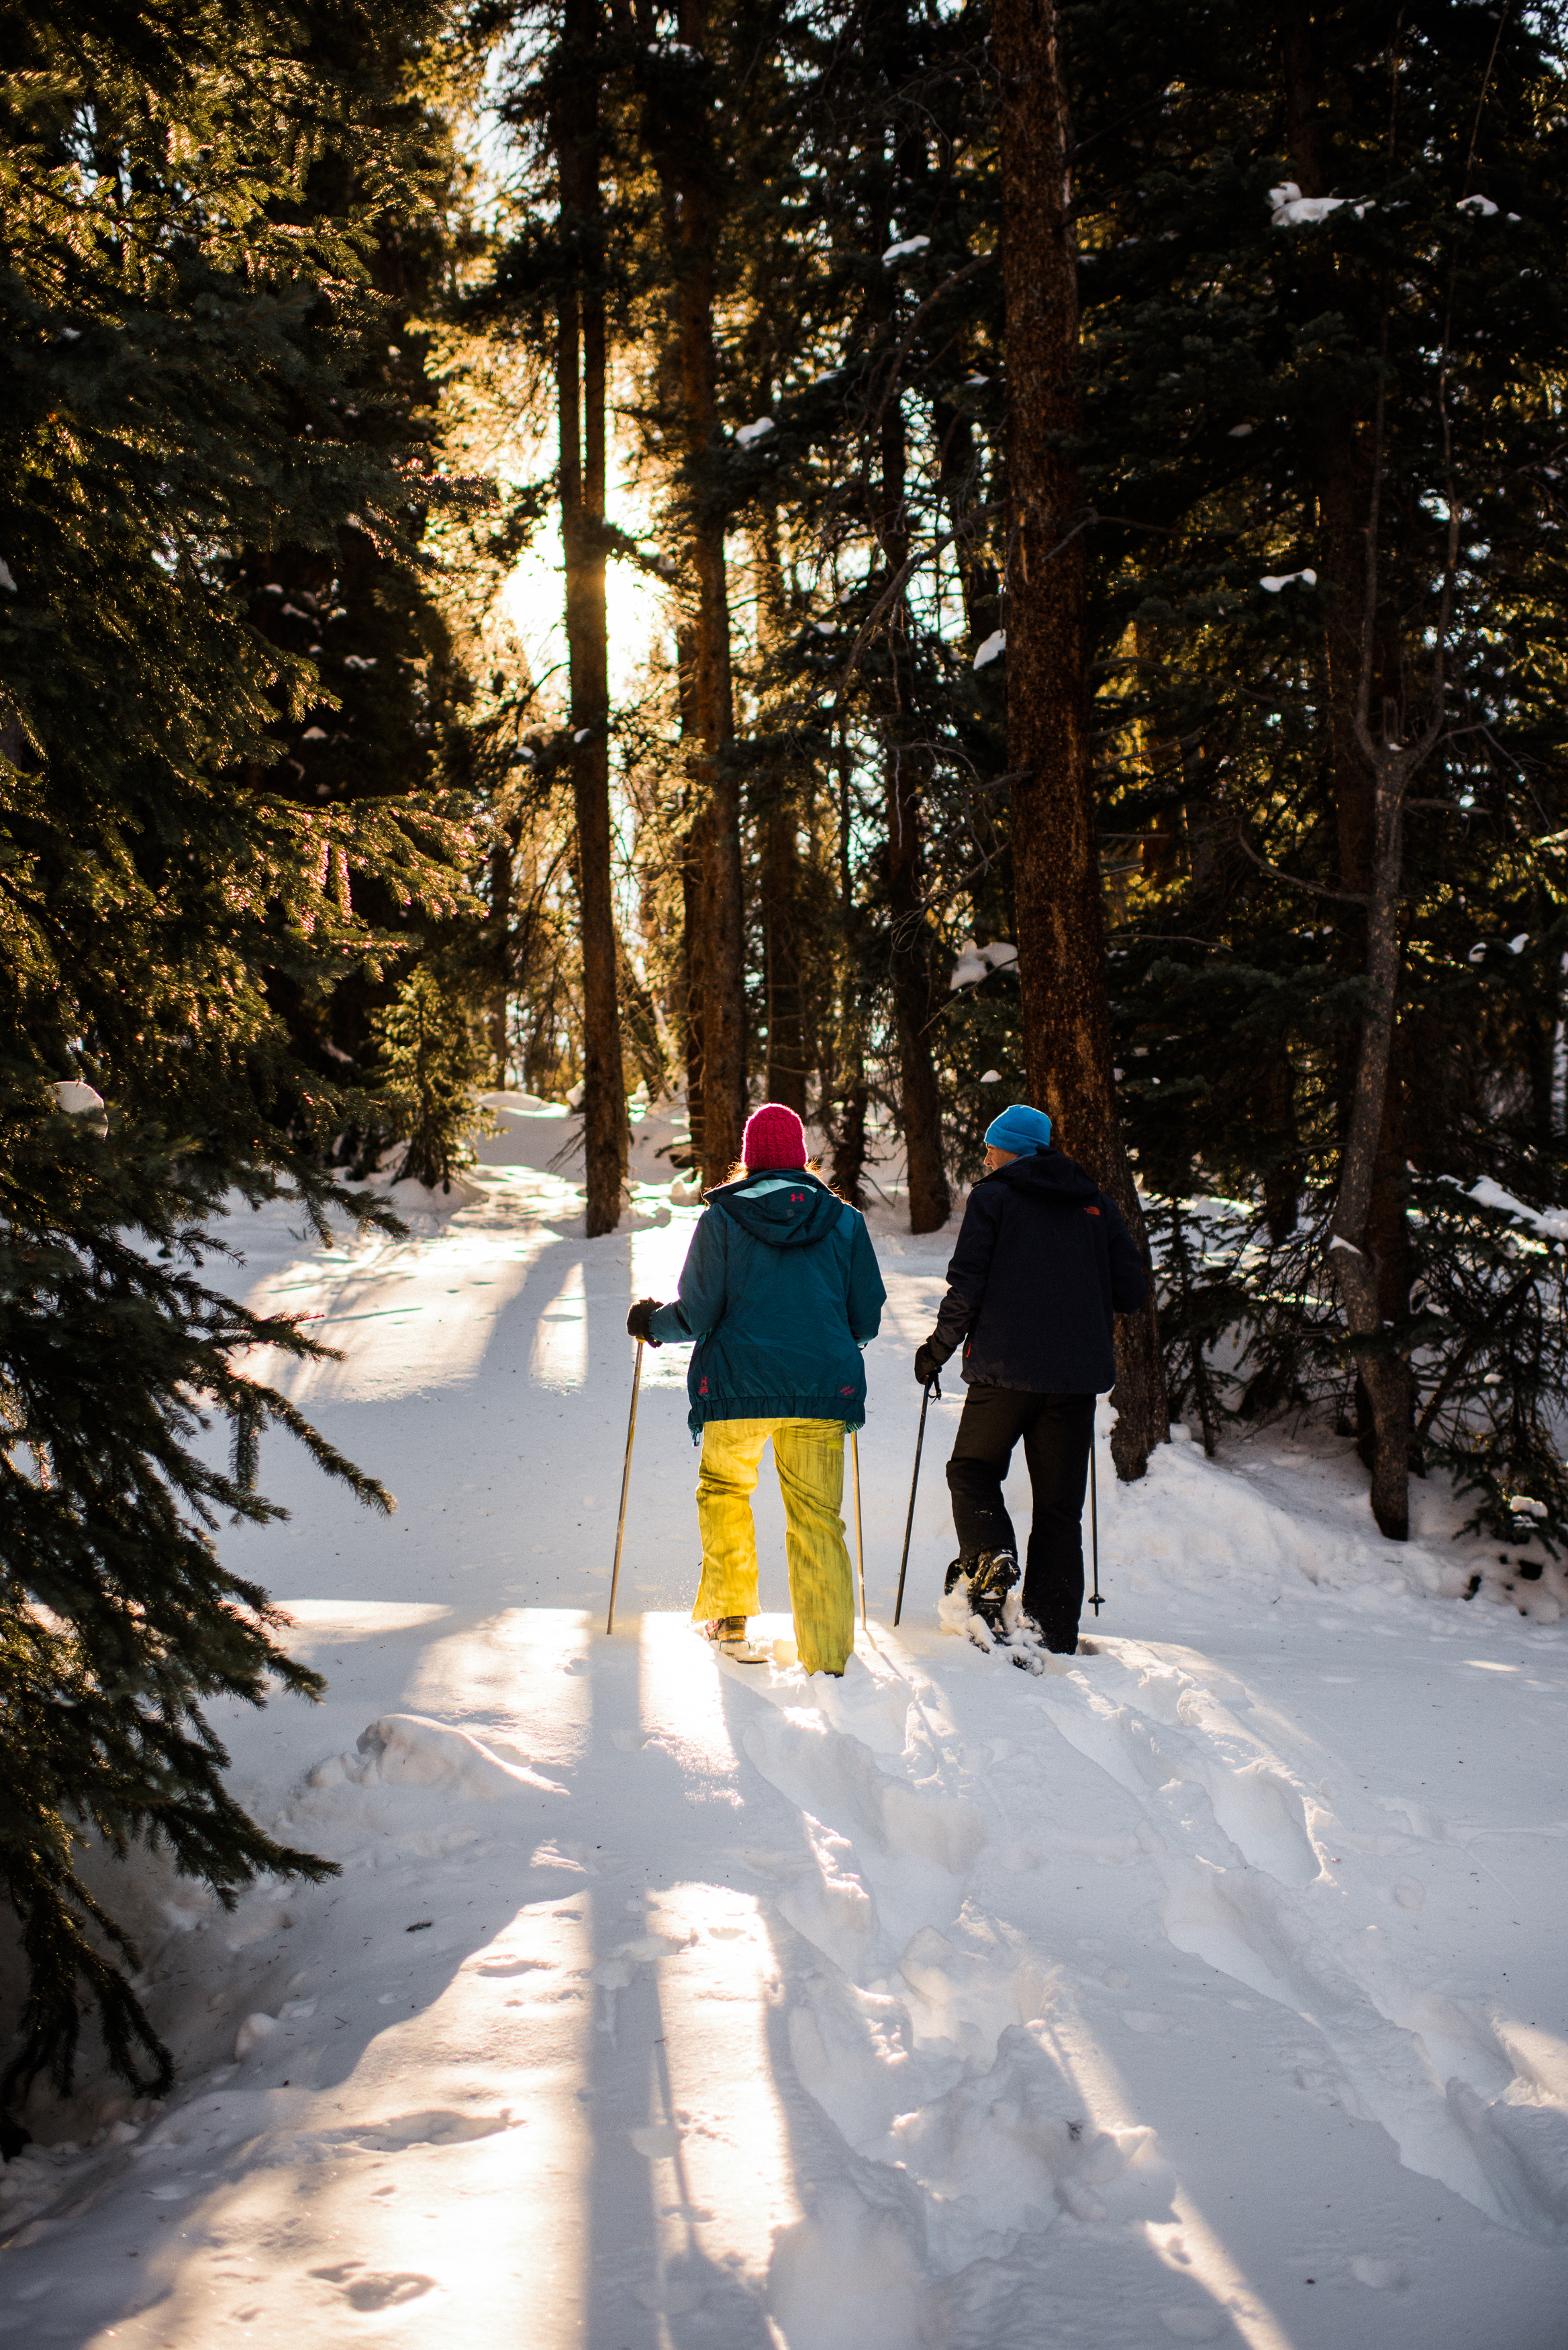 TaraShupe_Outdoor_Photographer_Loweprobags_Colorado_Copper_Mountains_Ski_85.jpg